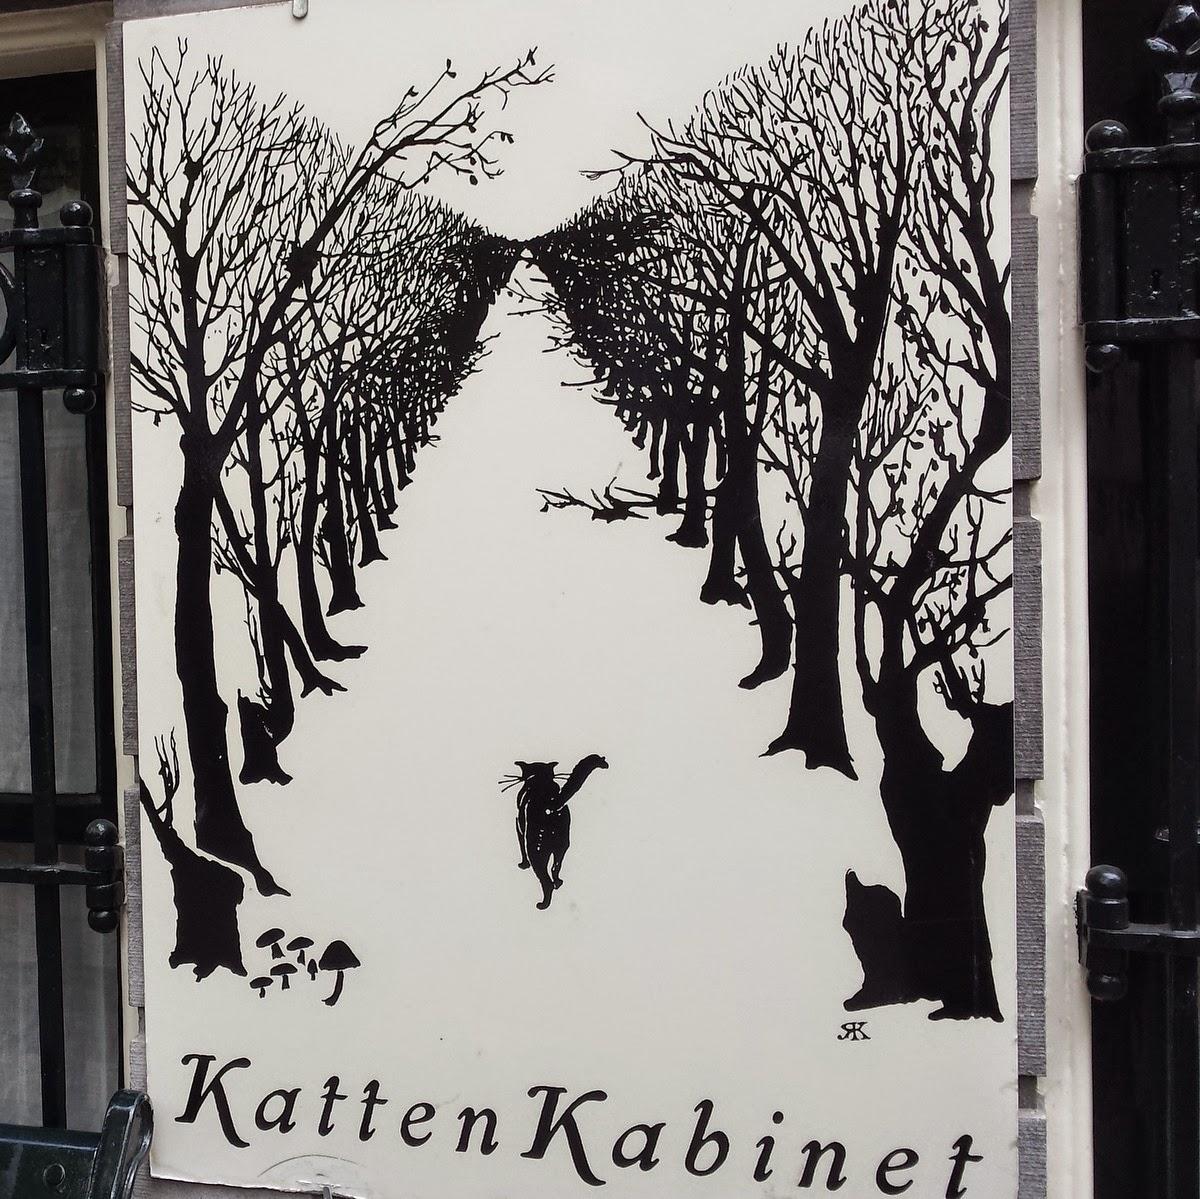 Amsterdam's Cat Museum: KattenKabinet